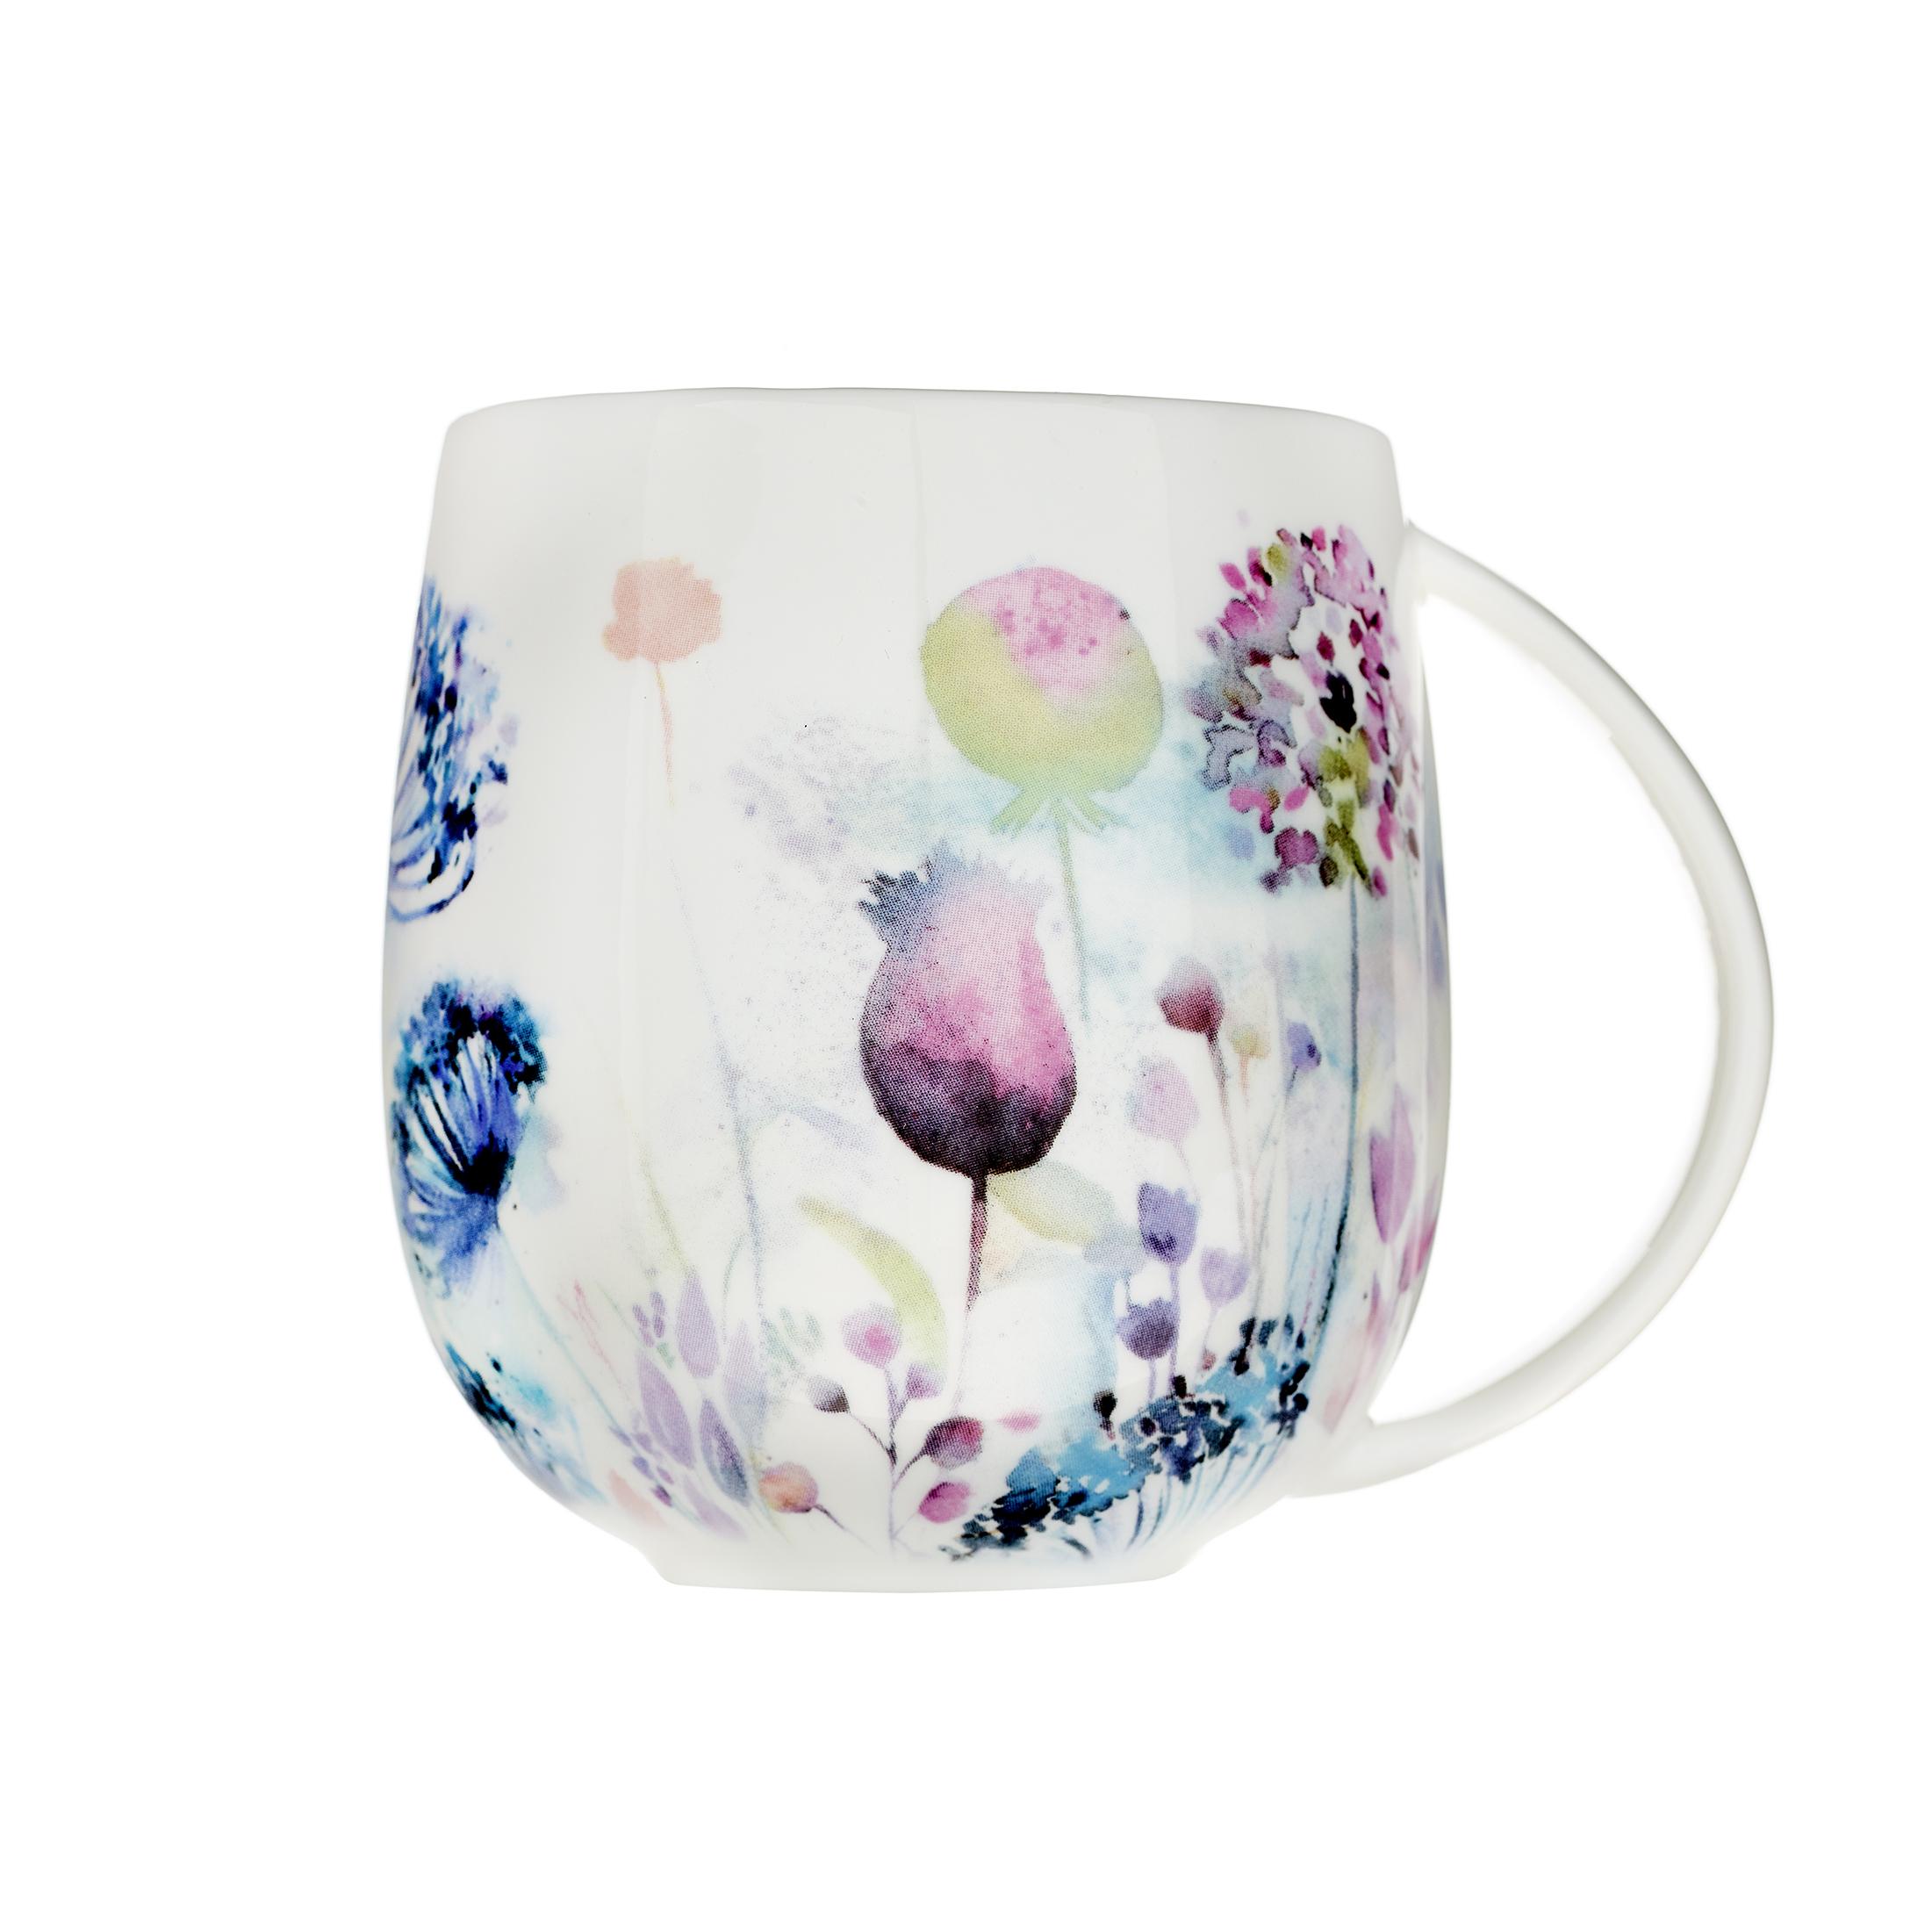 Meadow Mug 10(h) x 11.4(w) x 8.2cm(d)